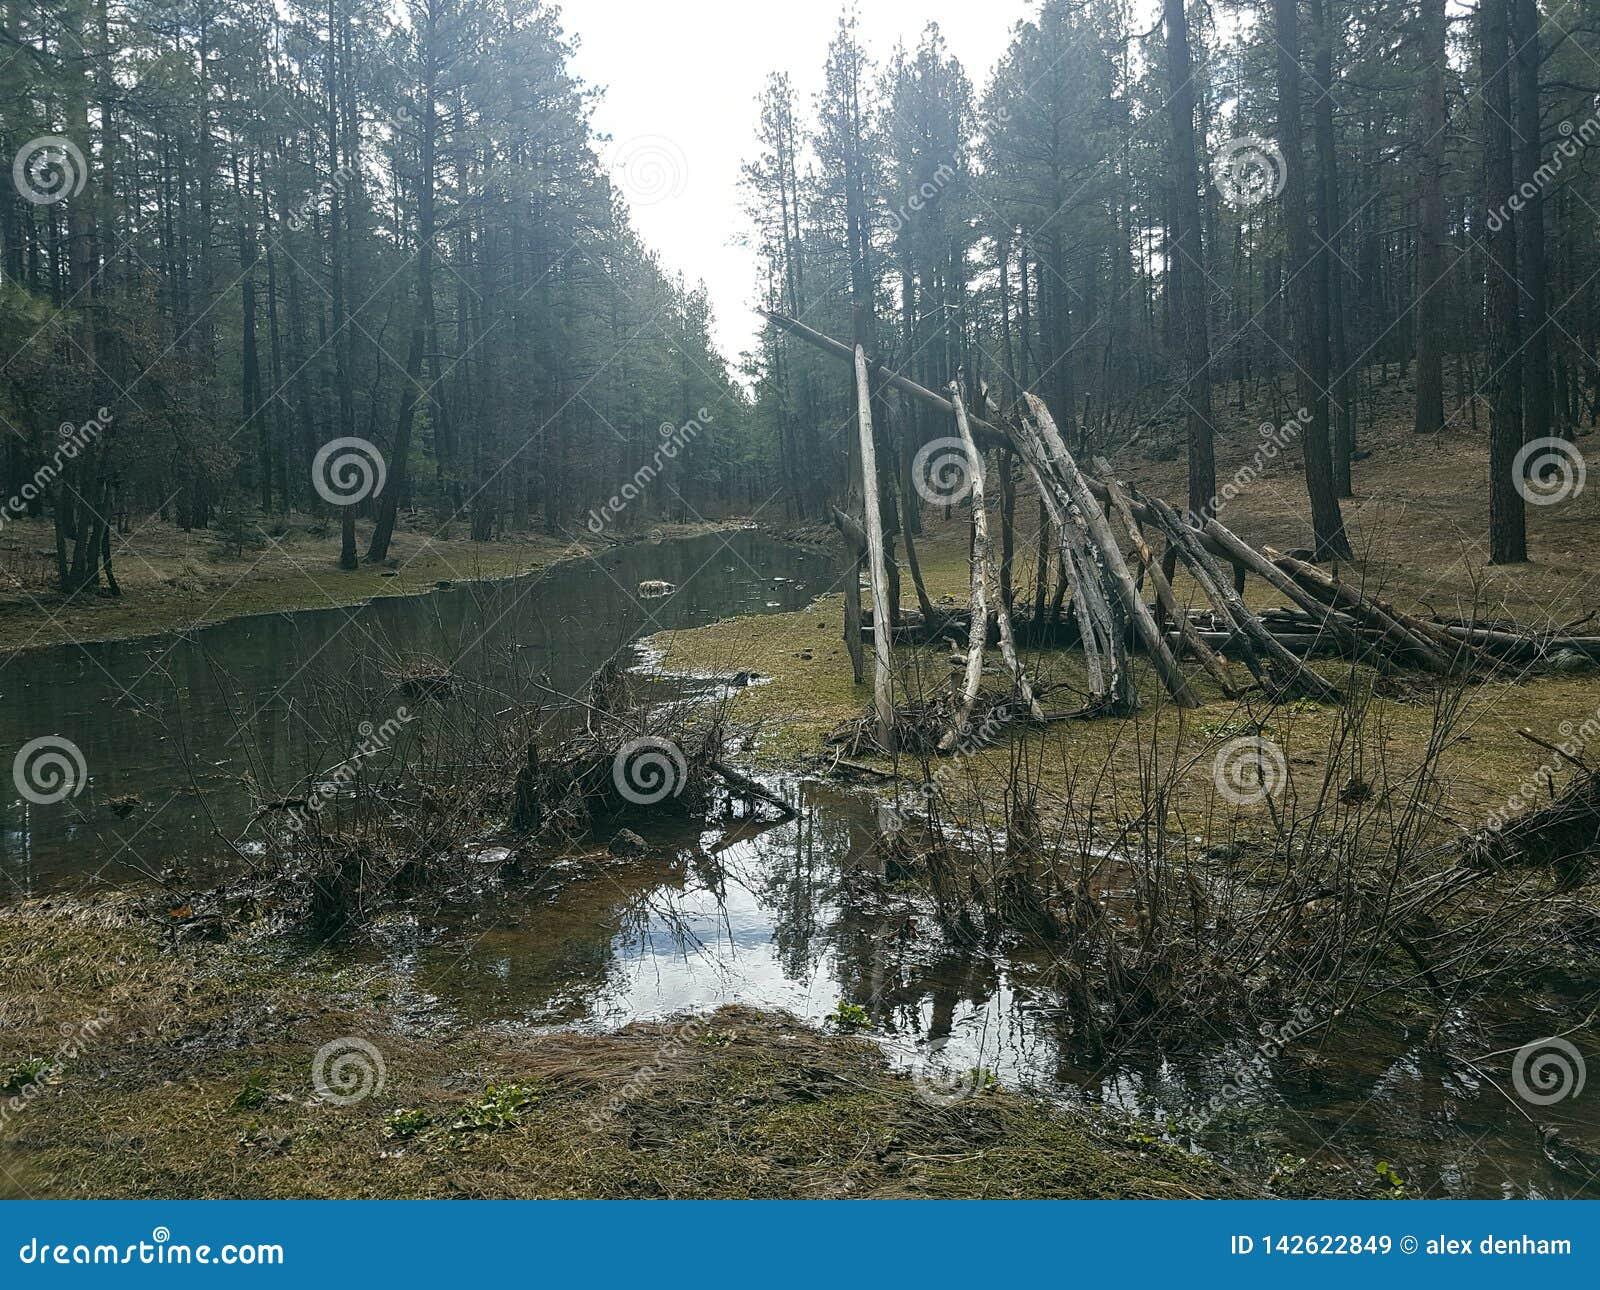 A log teepee next to the Creek